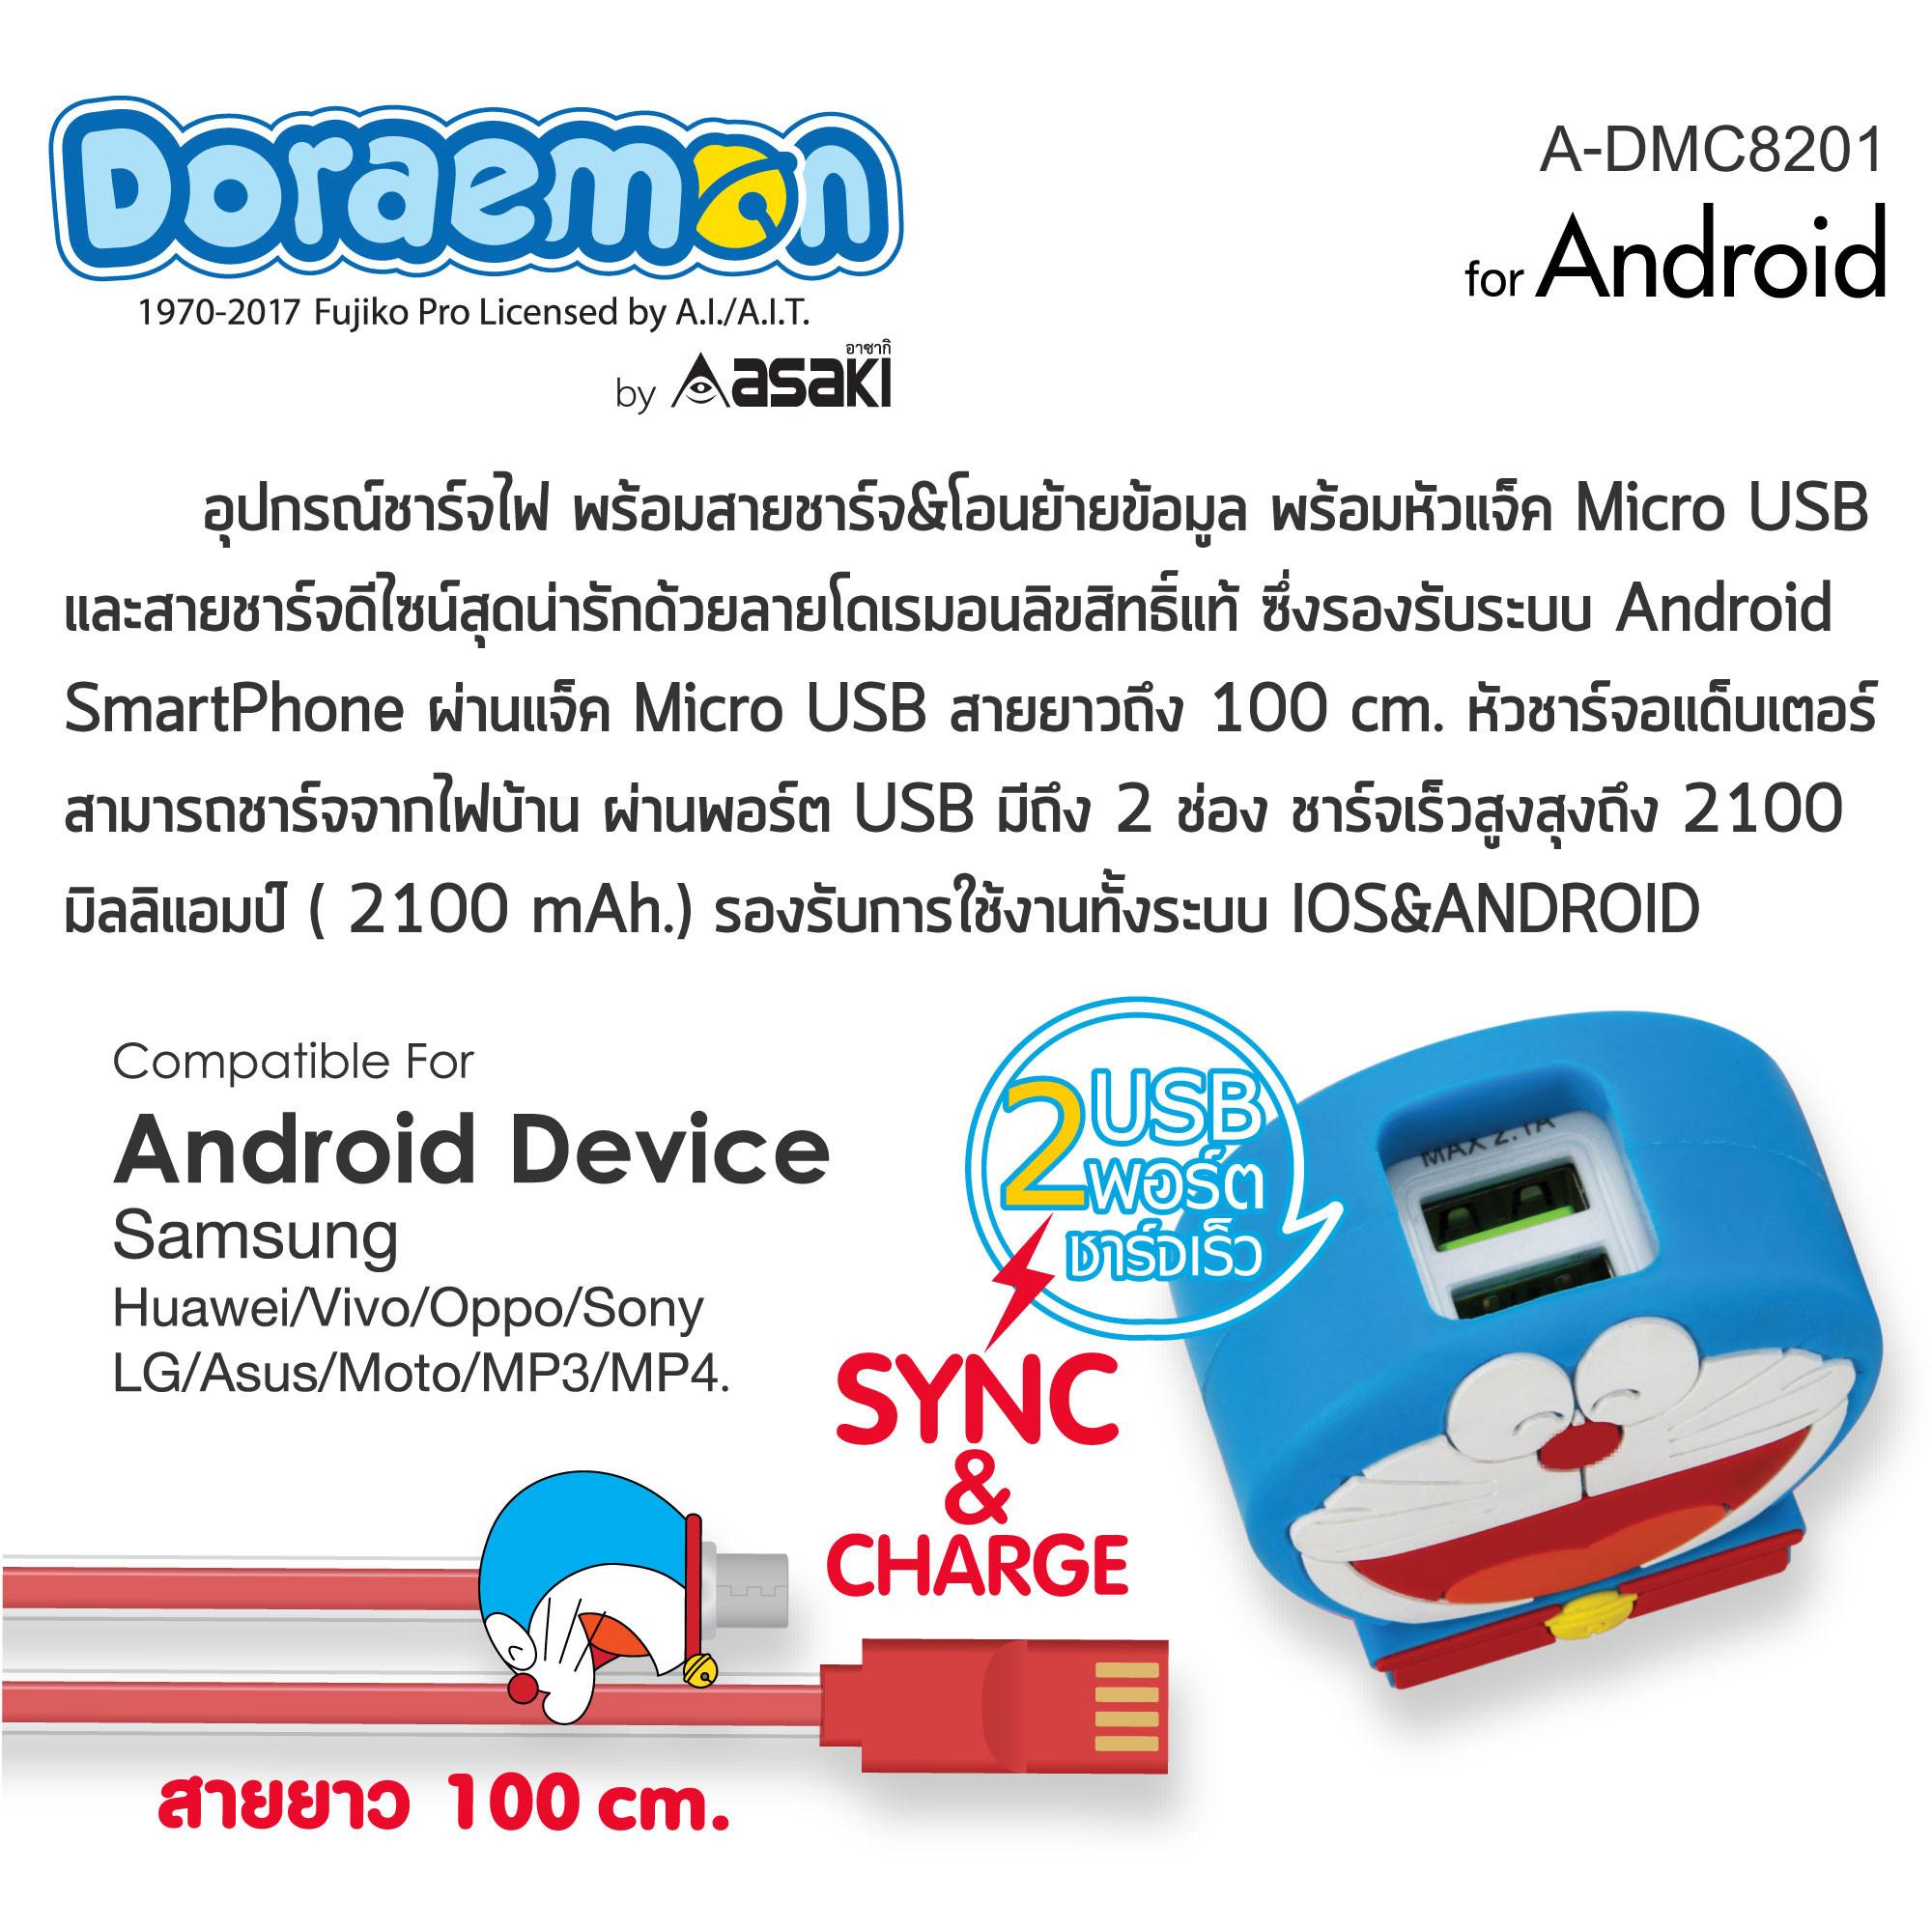 spec1-admc8201.jpg